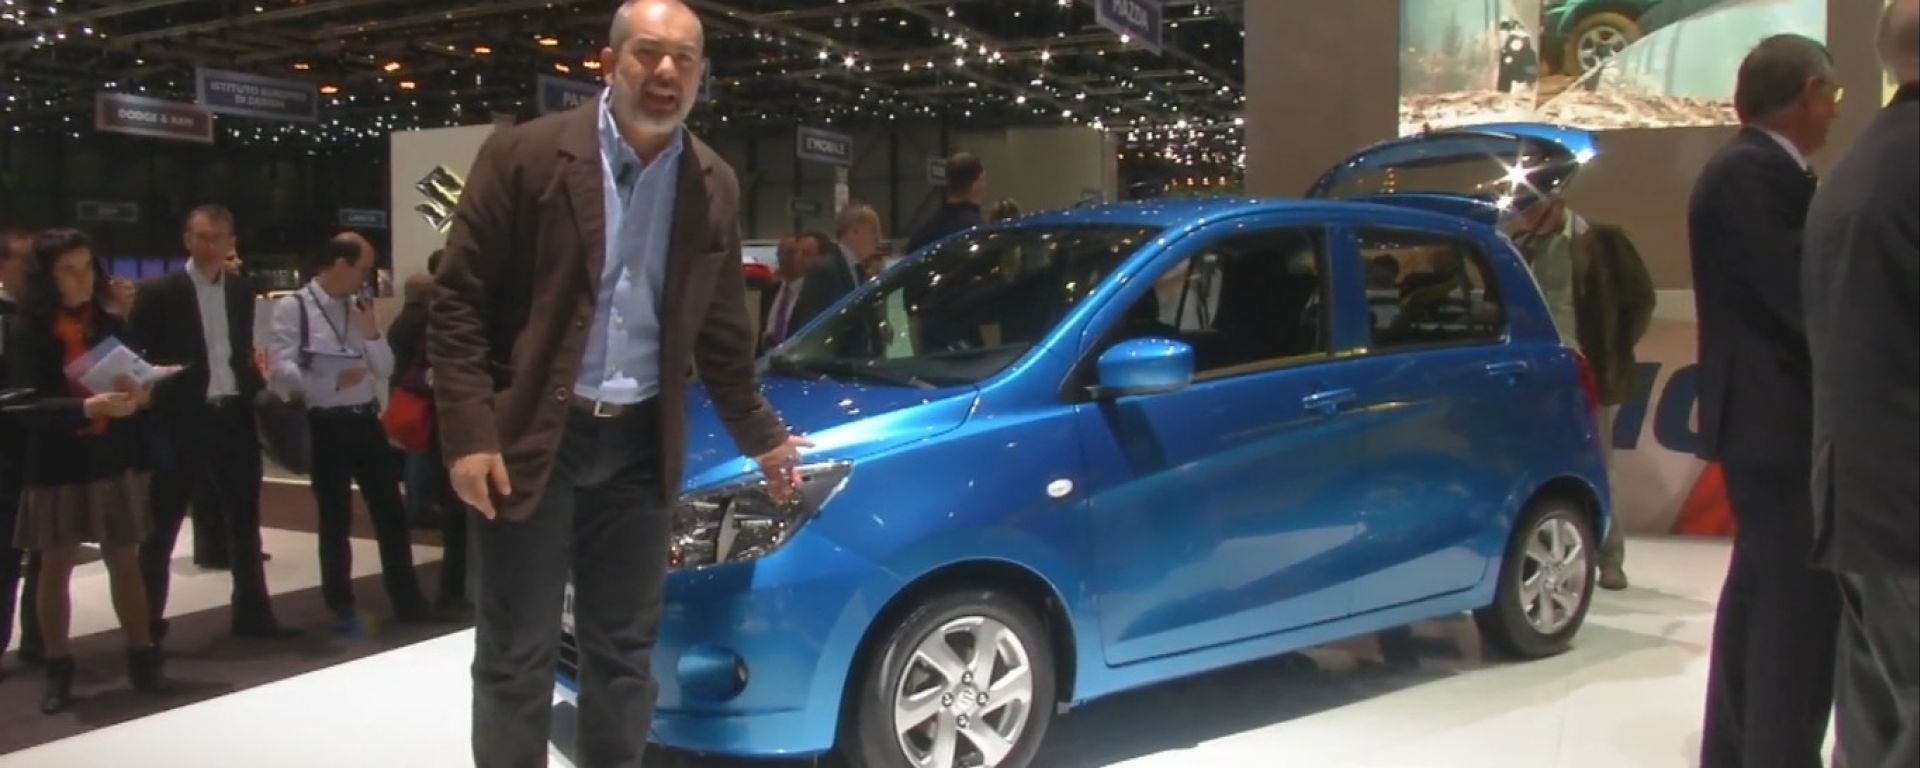 Salone di Ginevra 2014, lo stand Suzuki